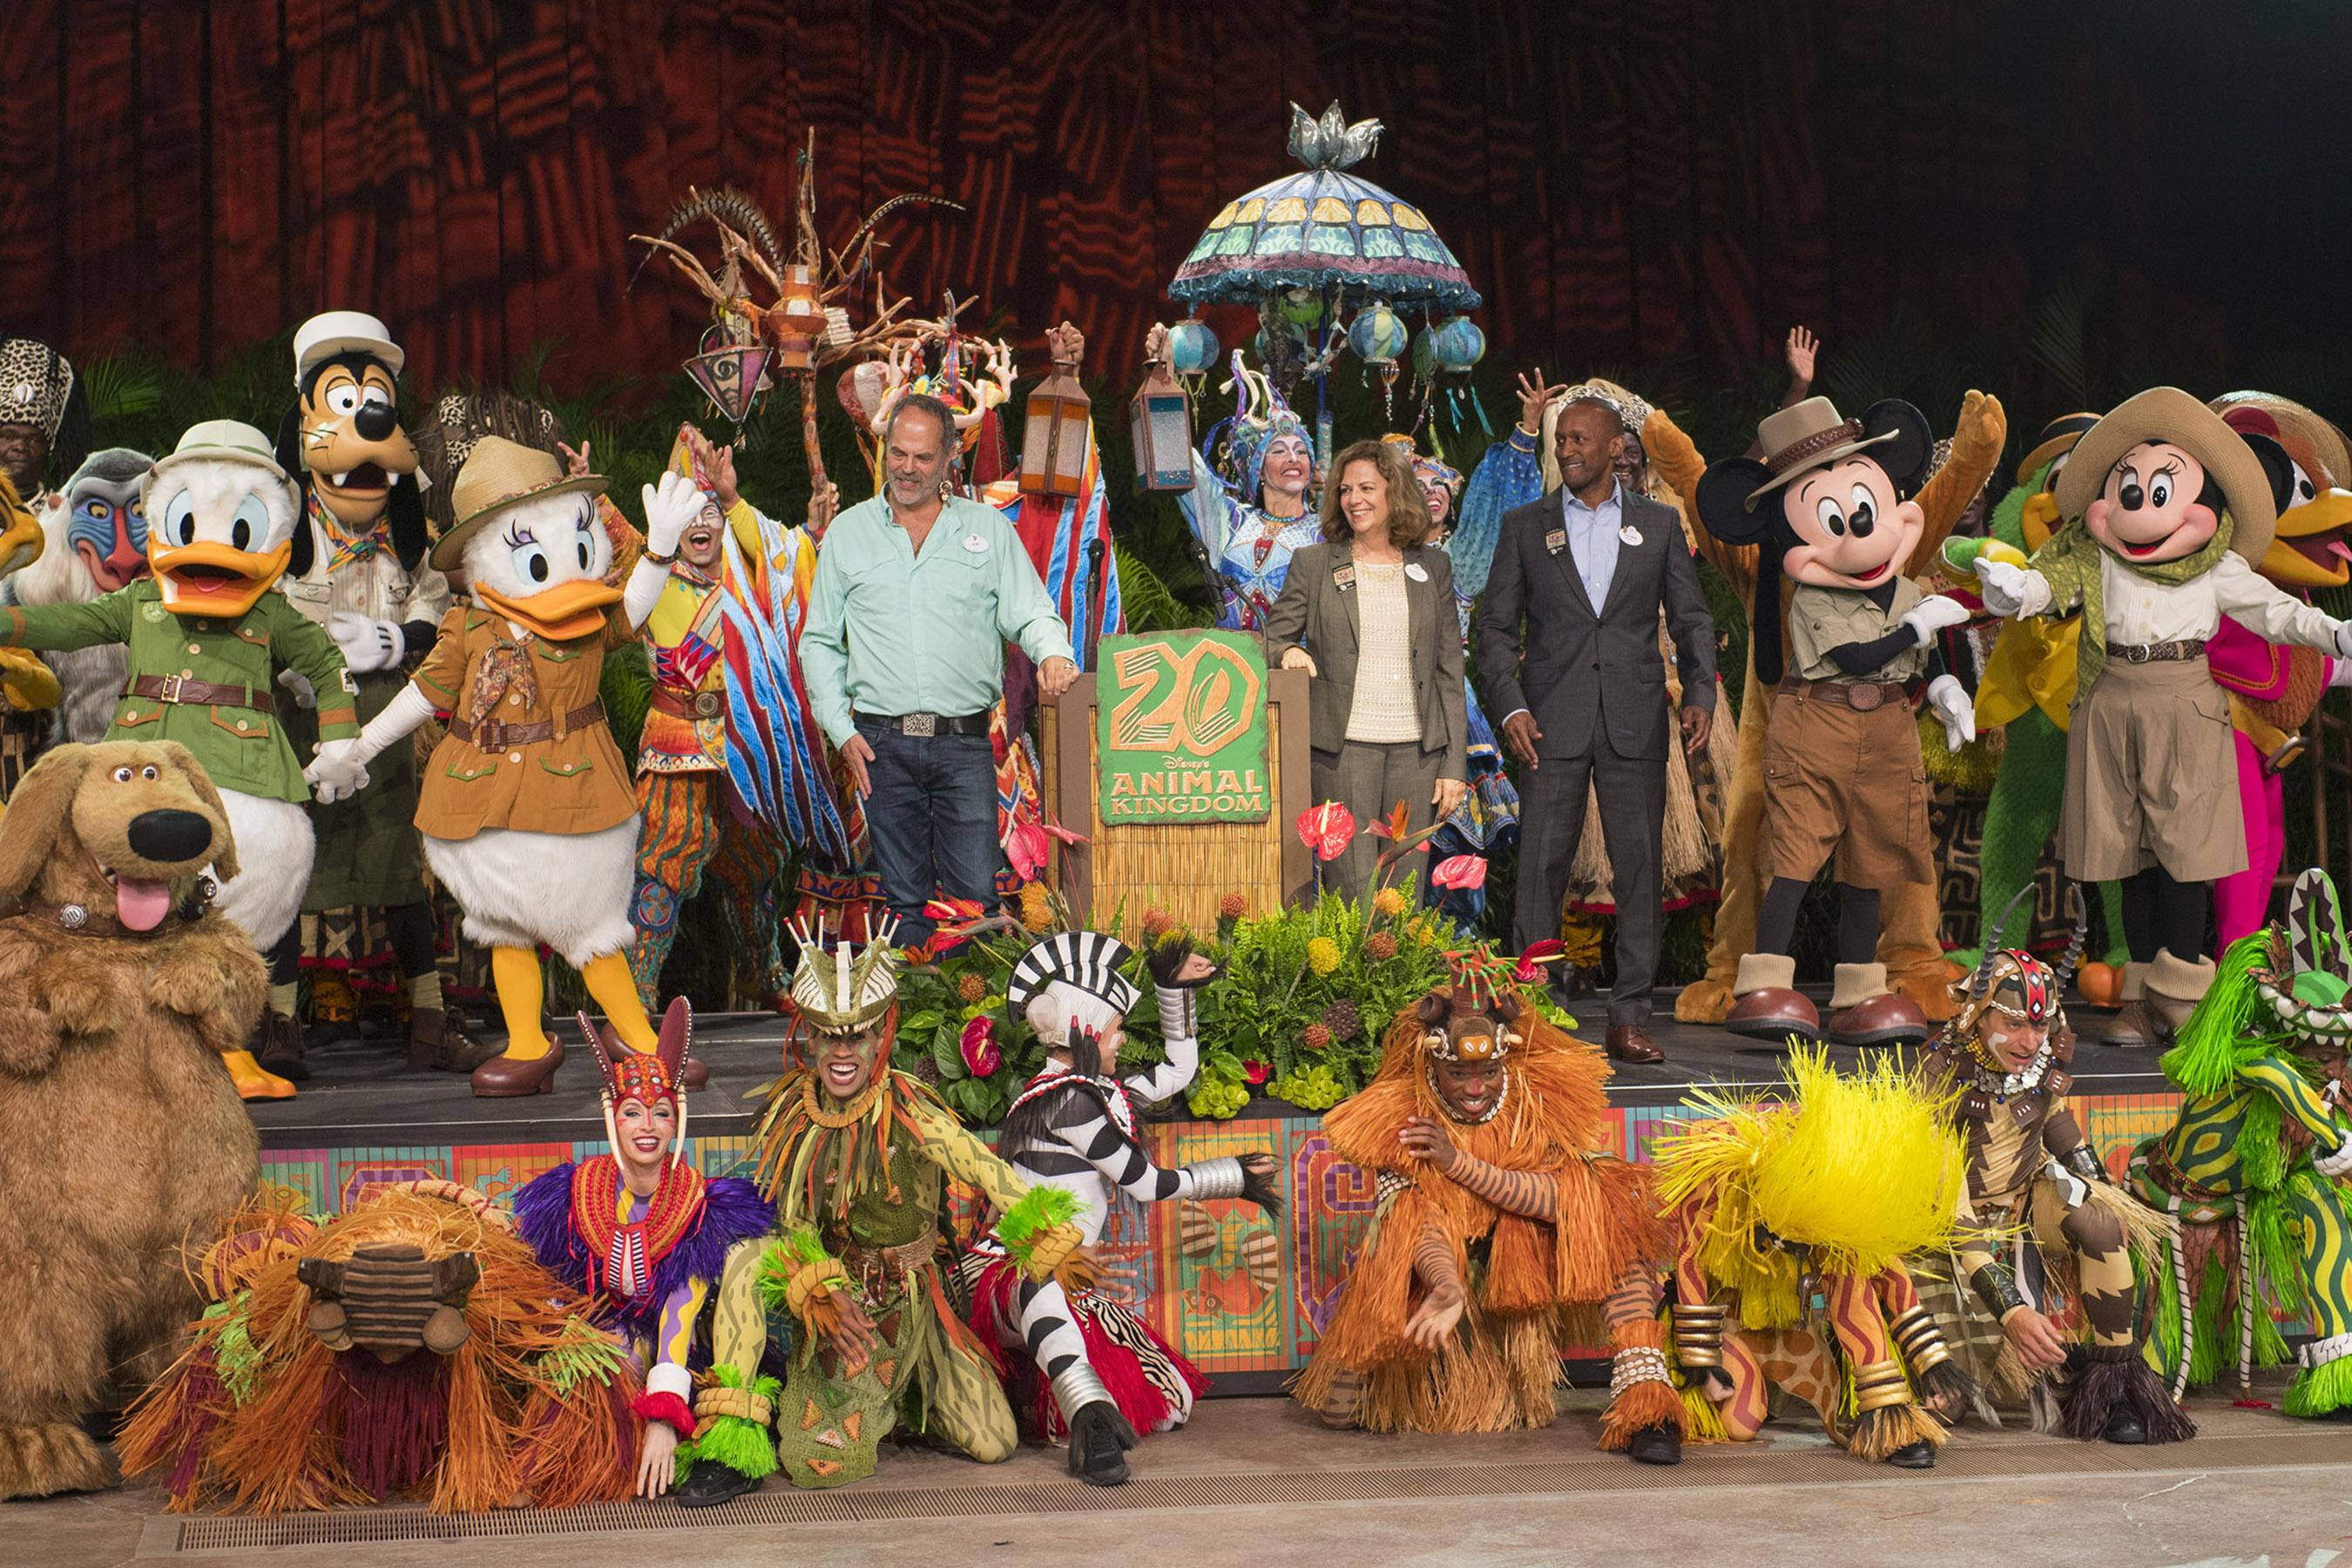 Disney's Animal Kingdom 20th Anniversary